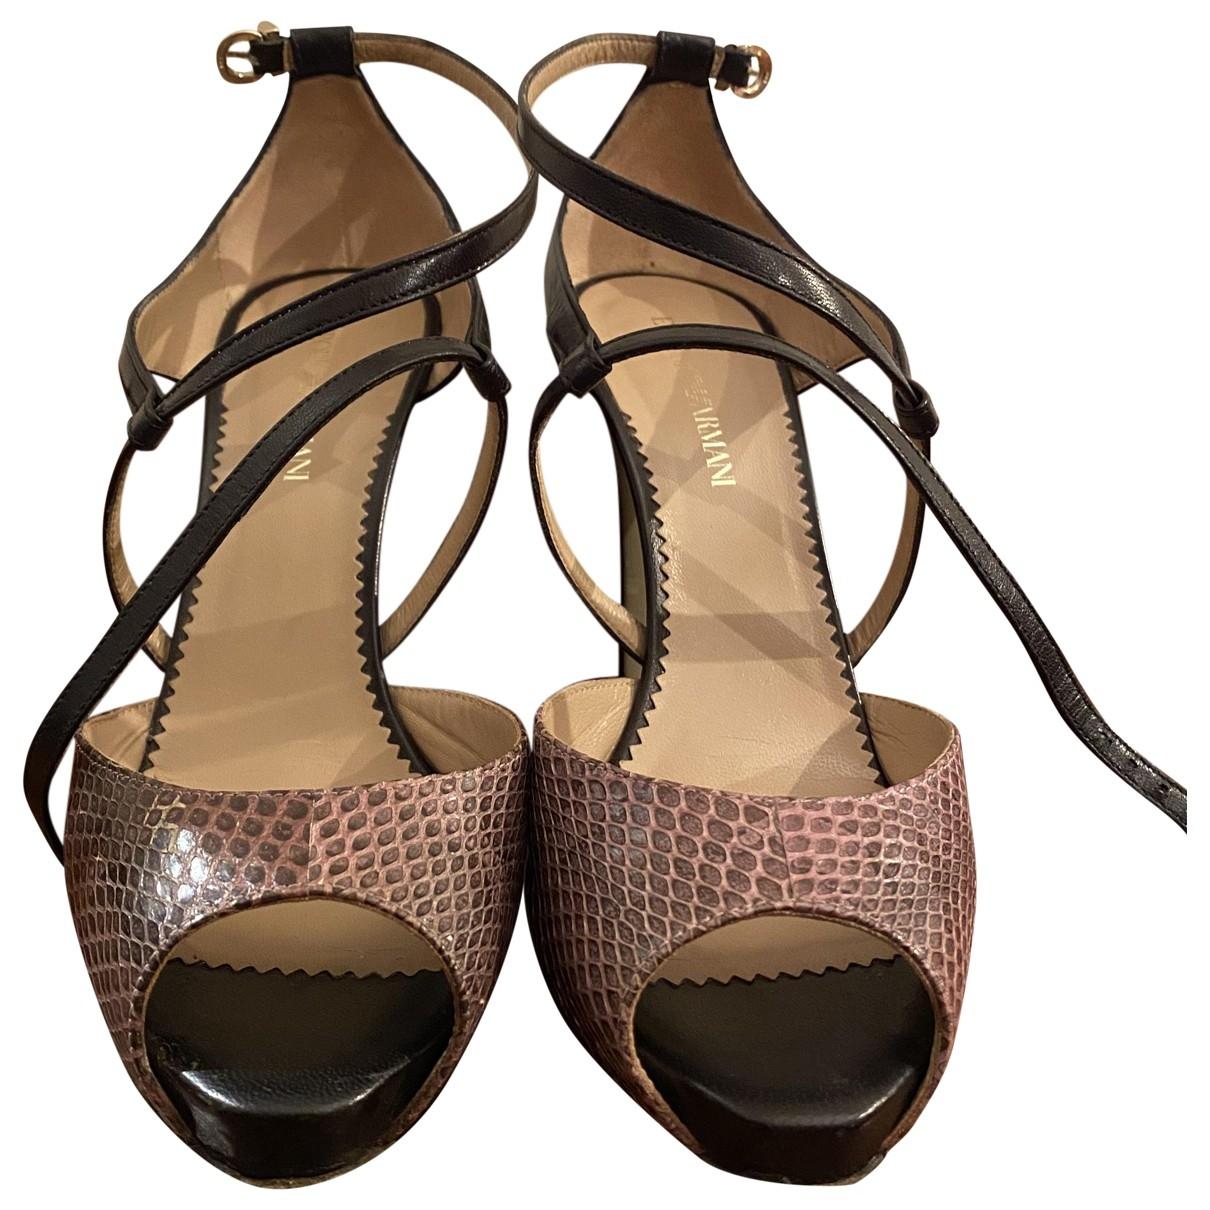 Emporio Armani \N Black Leather Heels for Women 38.5 EU